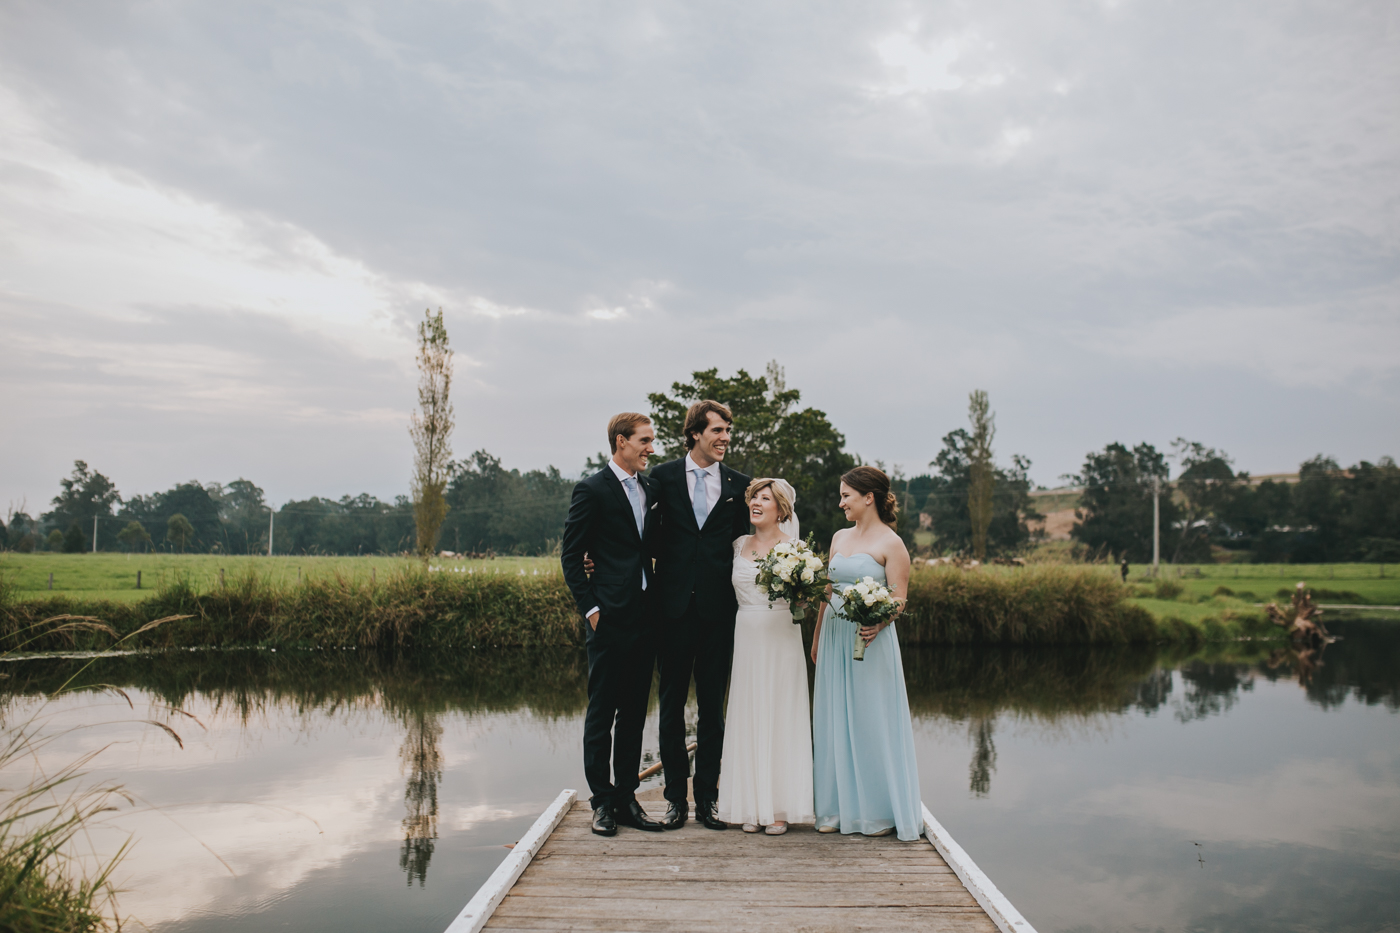 Rachel & Jacob - Willow Farm Berry - South Coast Wedding - Samantha Heather Photography-124.jpg